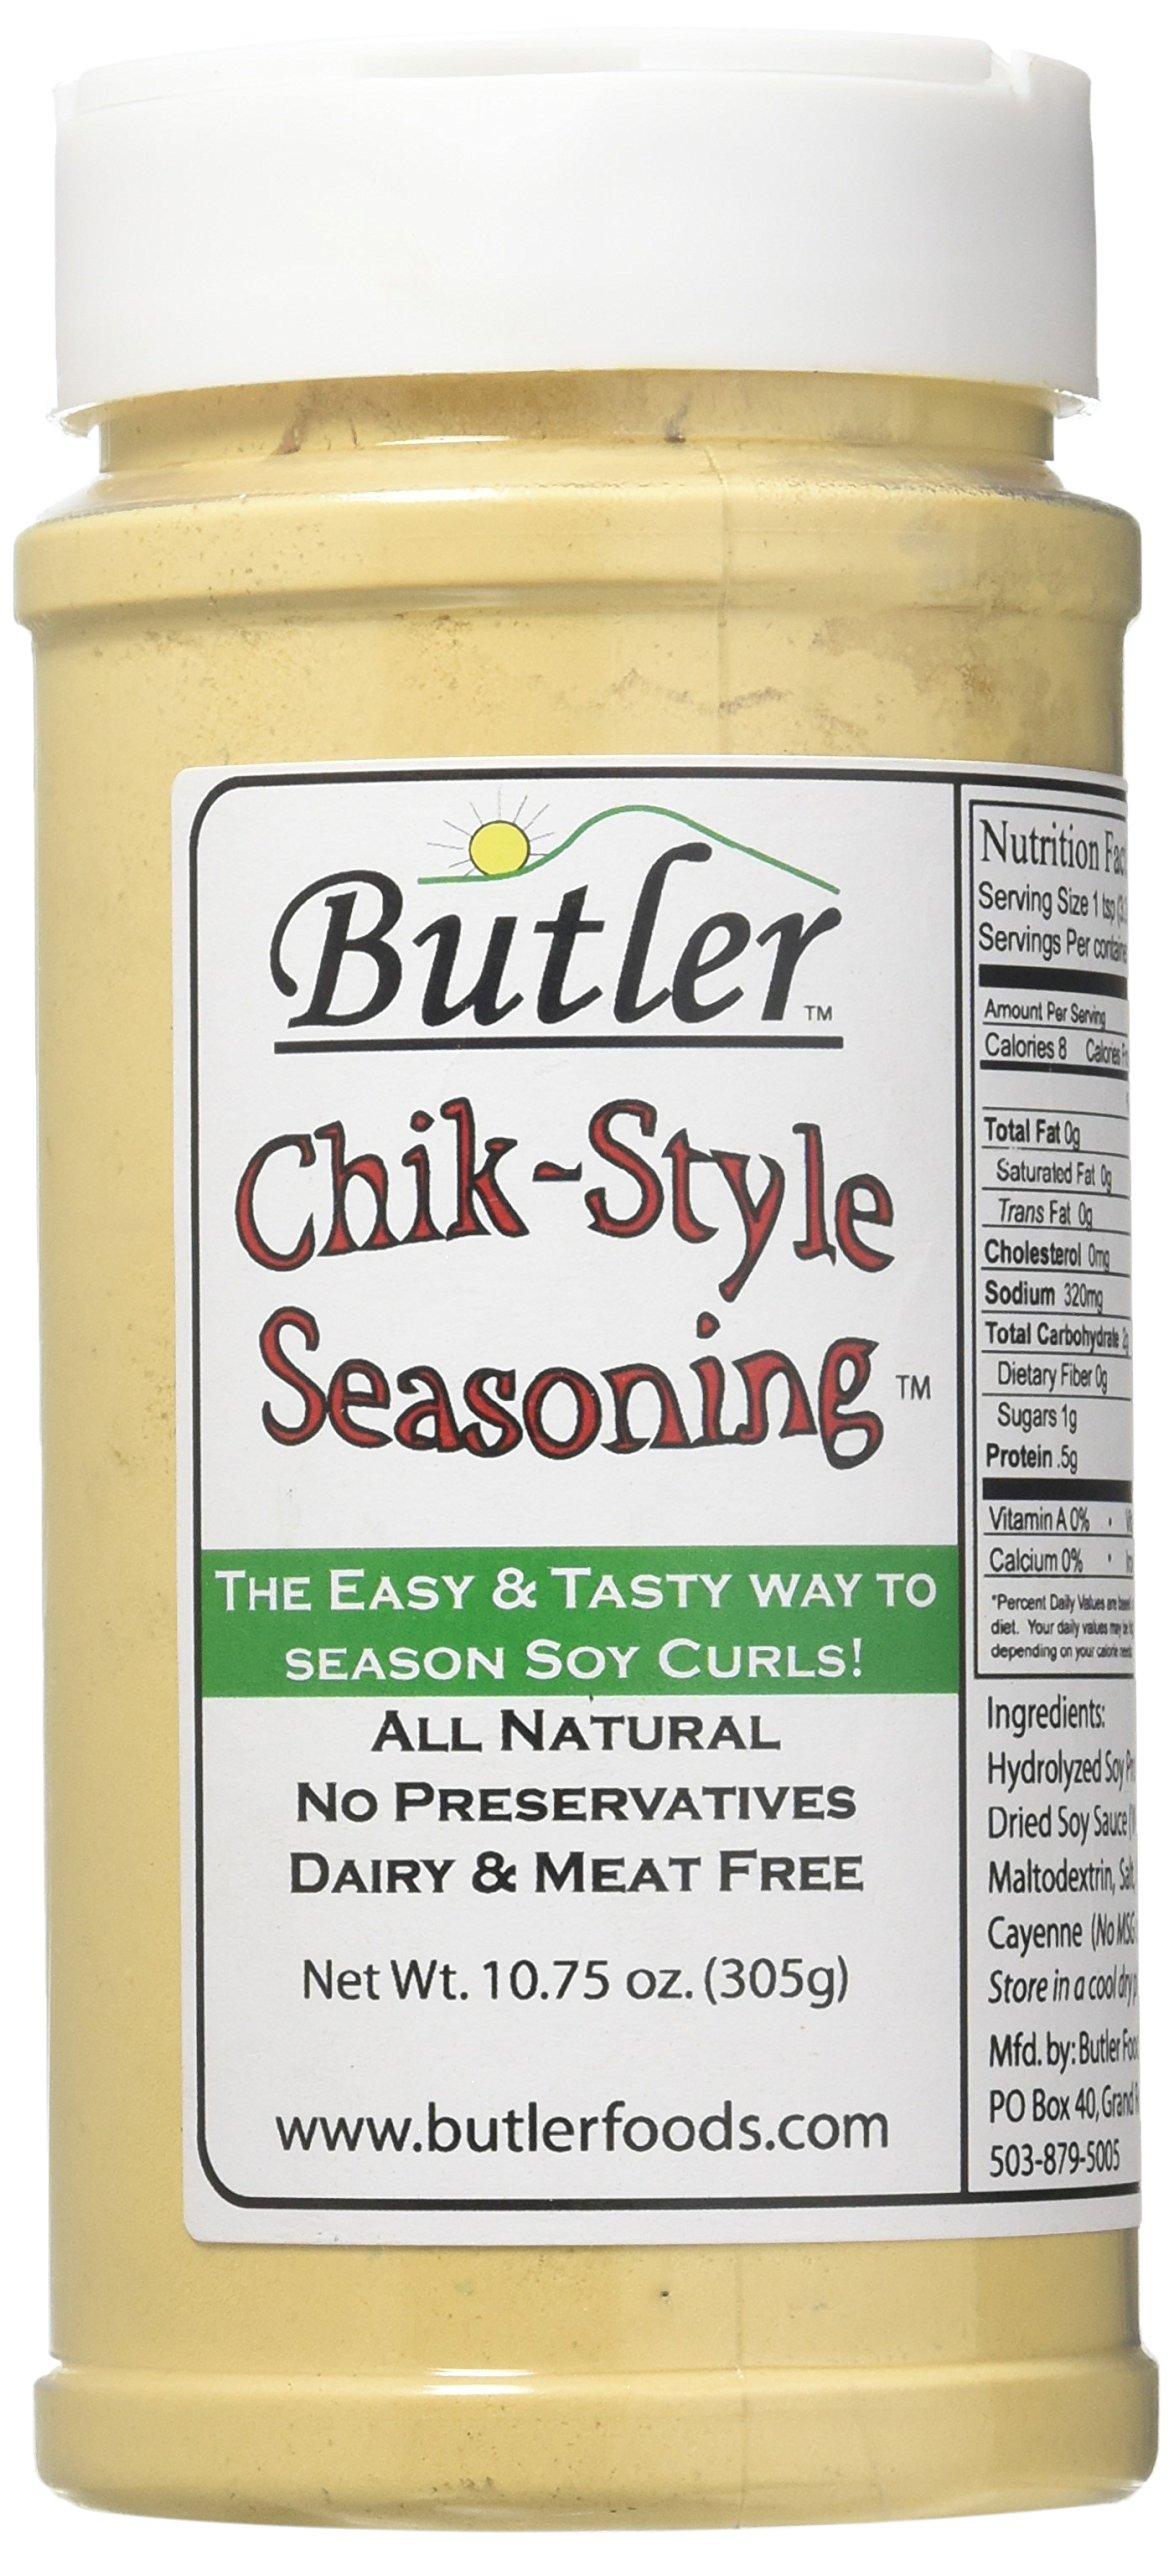 Chik-Style Seasoning - 10.75 oz Jar